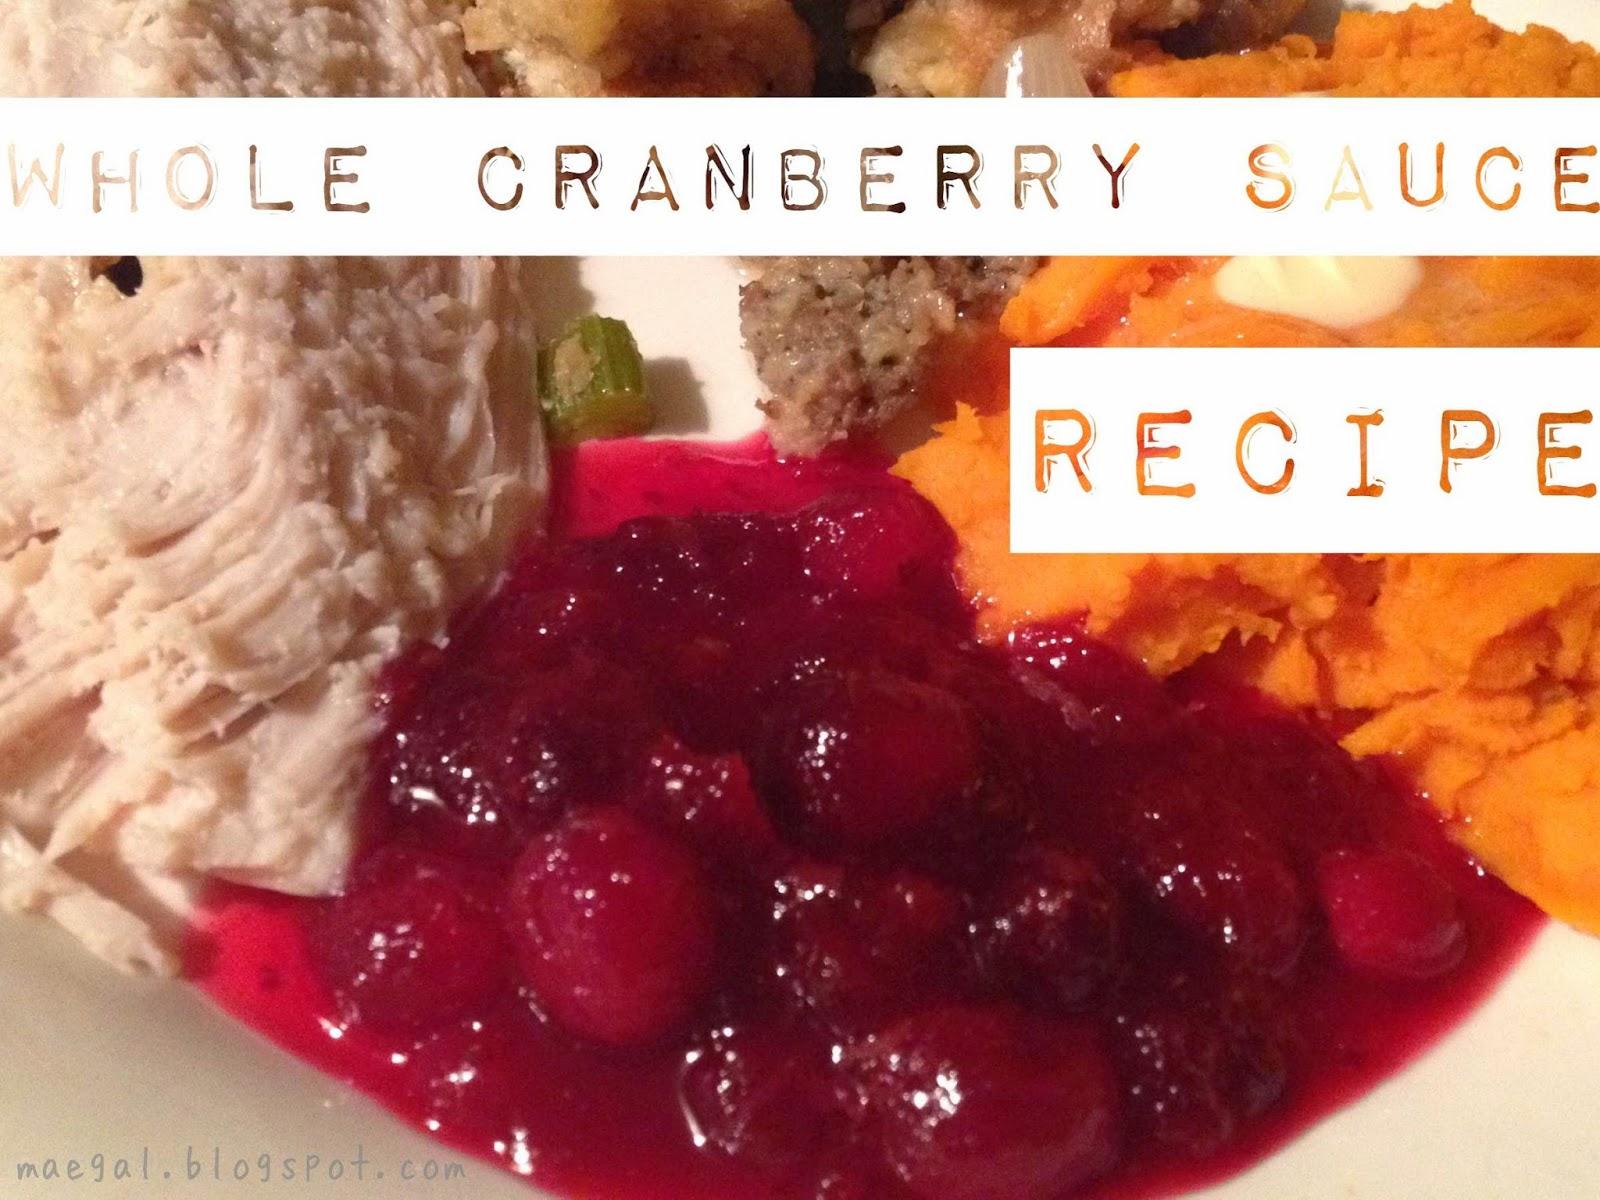 whole cranberry sauce recipe | maegal.blogspot.com